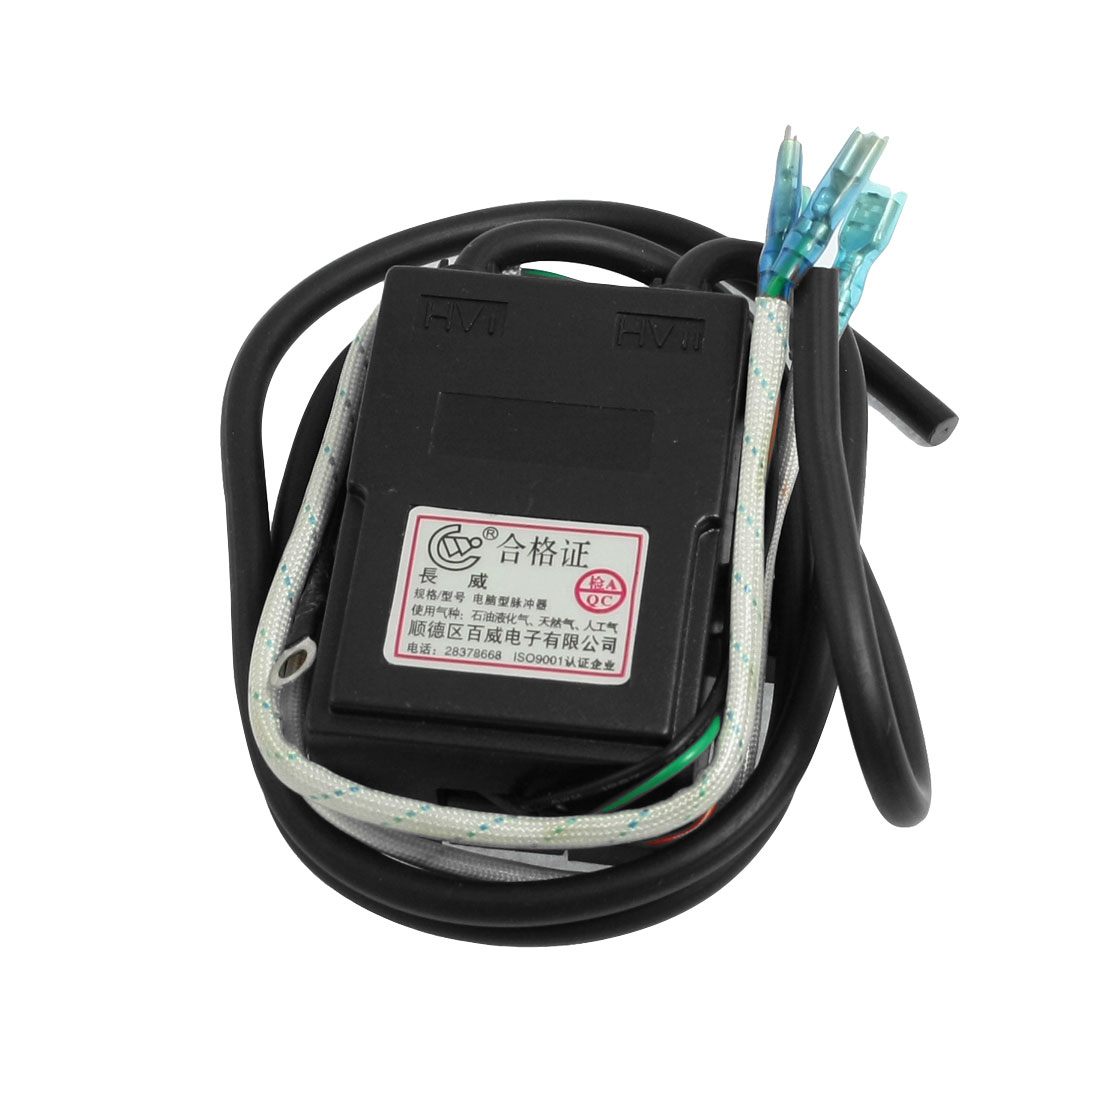 IC Control Double Ignitering Cord Flue Gas Stove Pulse Igniter Black